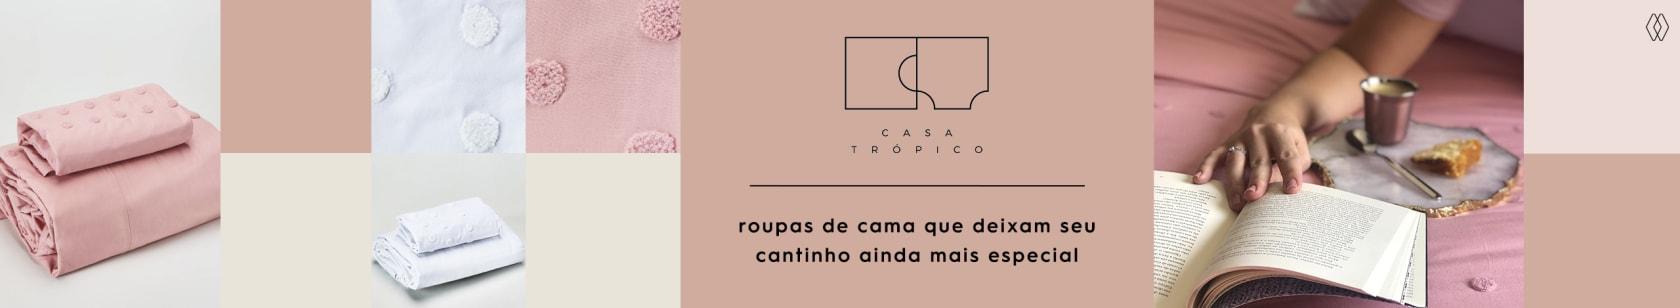 CASA TRÓPICO | AMARO